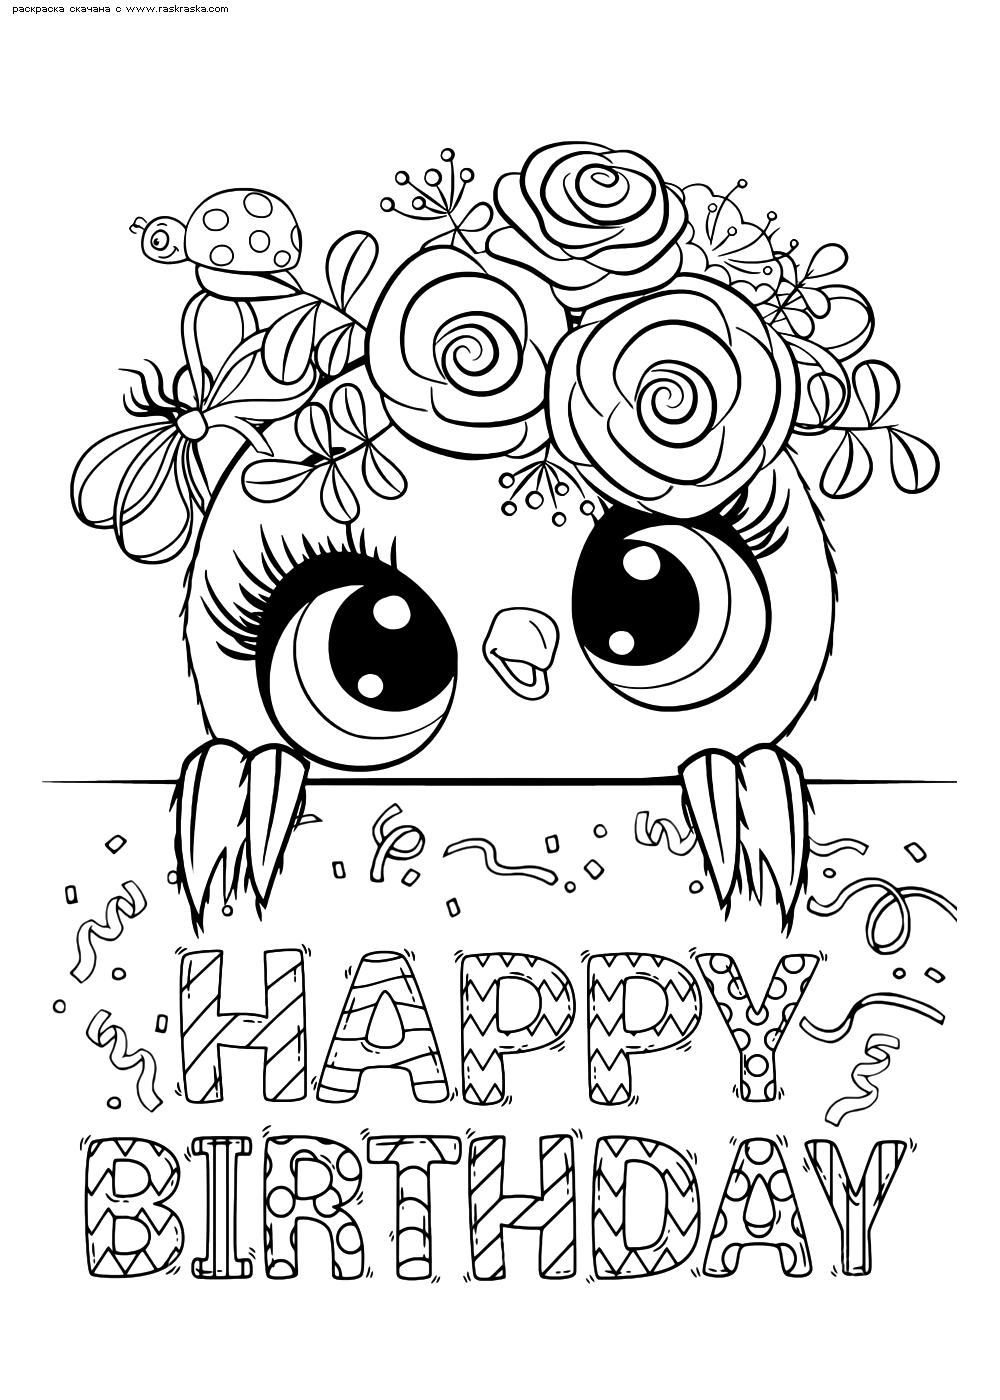 Раскраска С днем рождения!. Раскраска с днем рождения